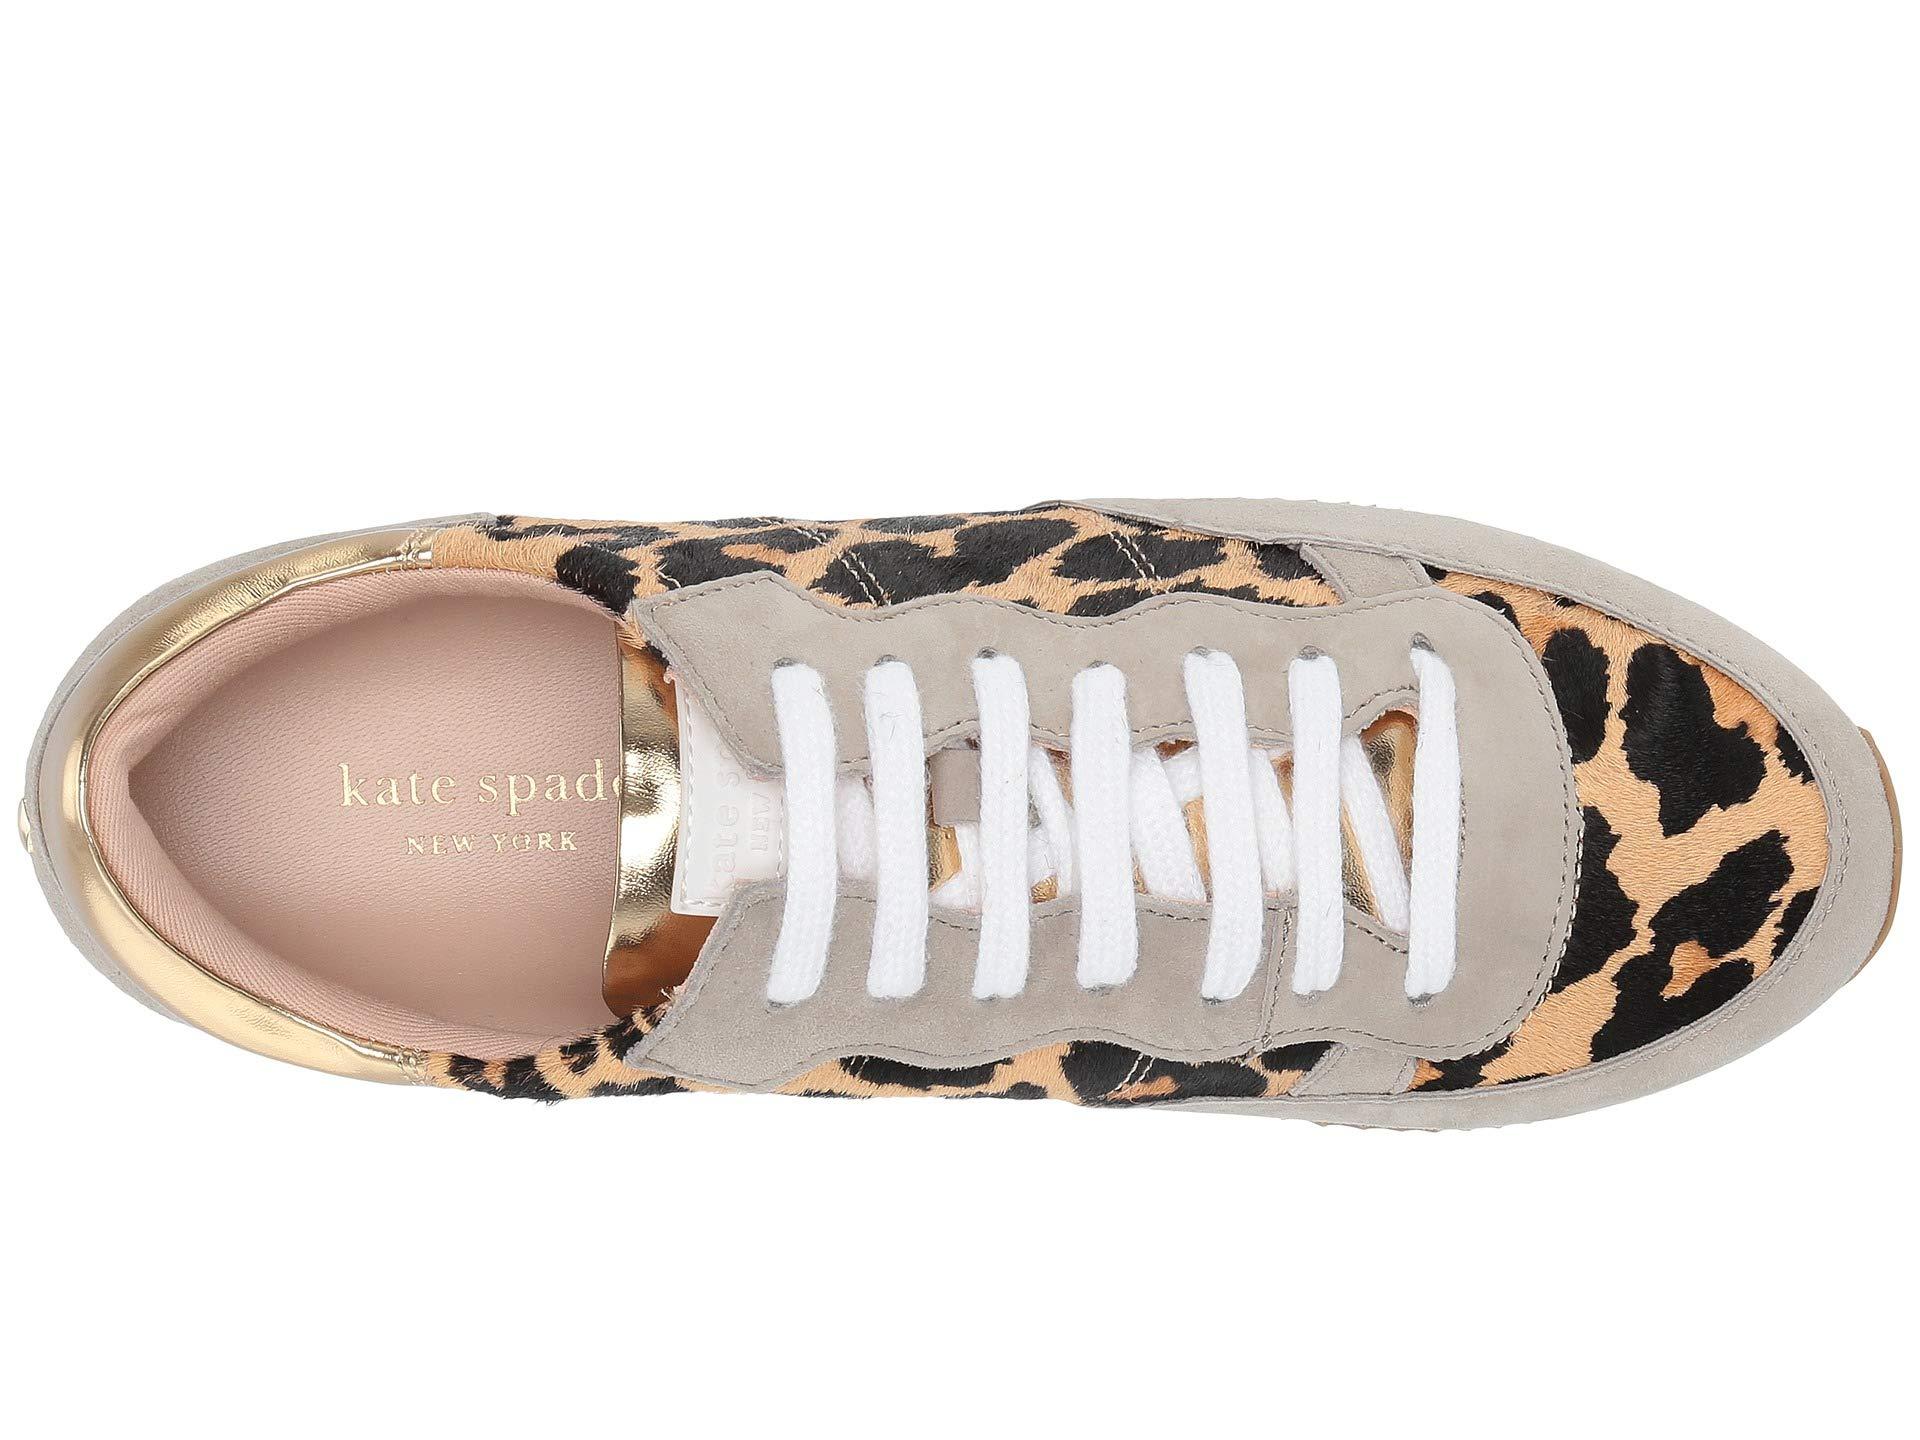 cd09f5d7b72c Kate Spade New York Felicia Sneaker at Luxury.Zappos.com